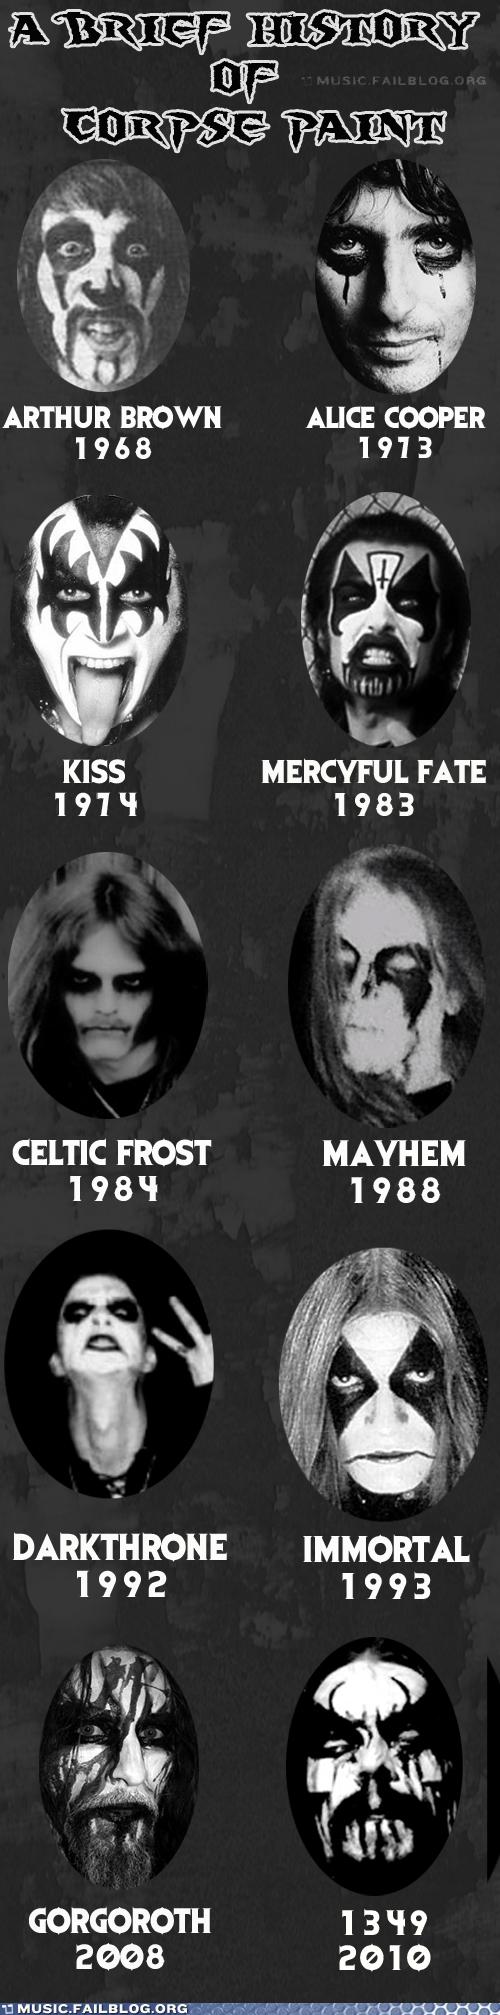 alice cooper,corpse paint,immortal,KISS,metal